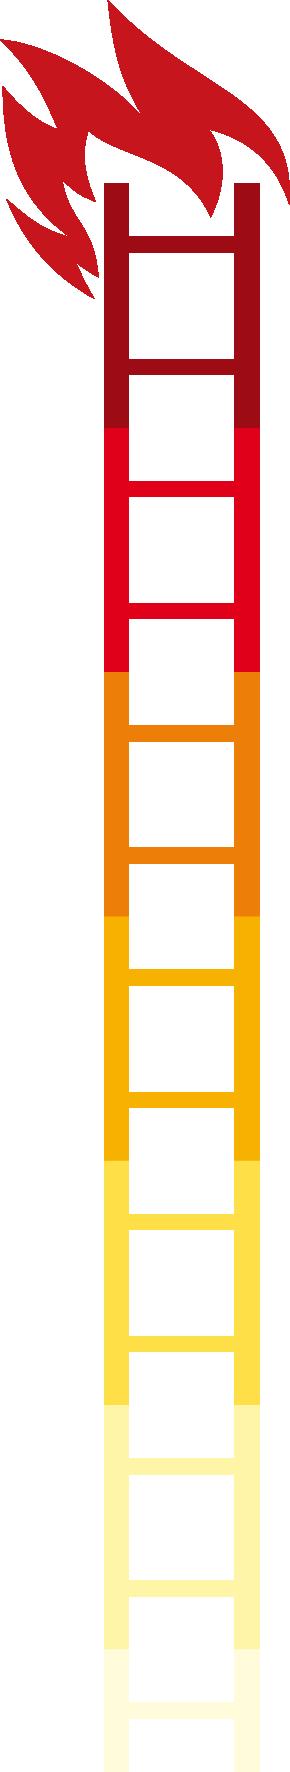 Heat Index_ladder.png